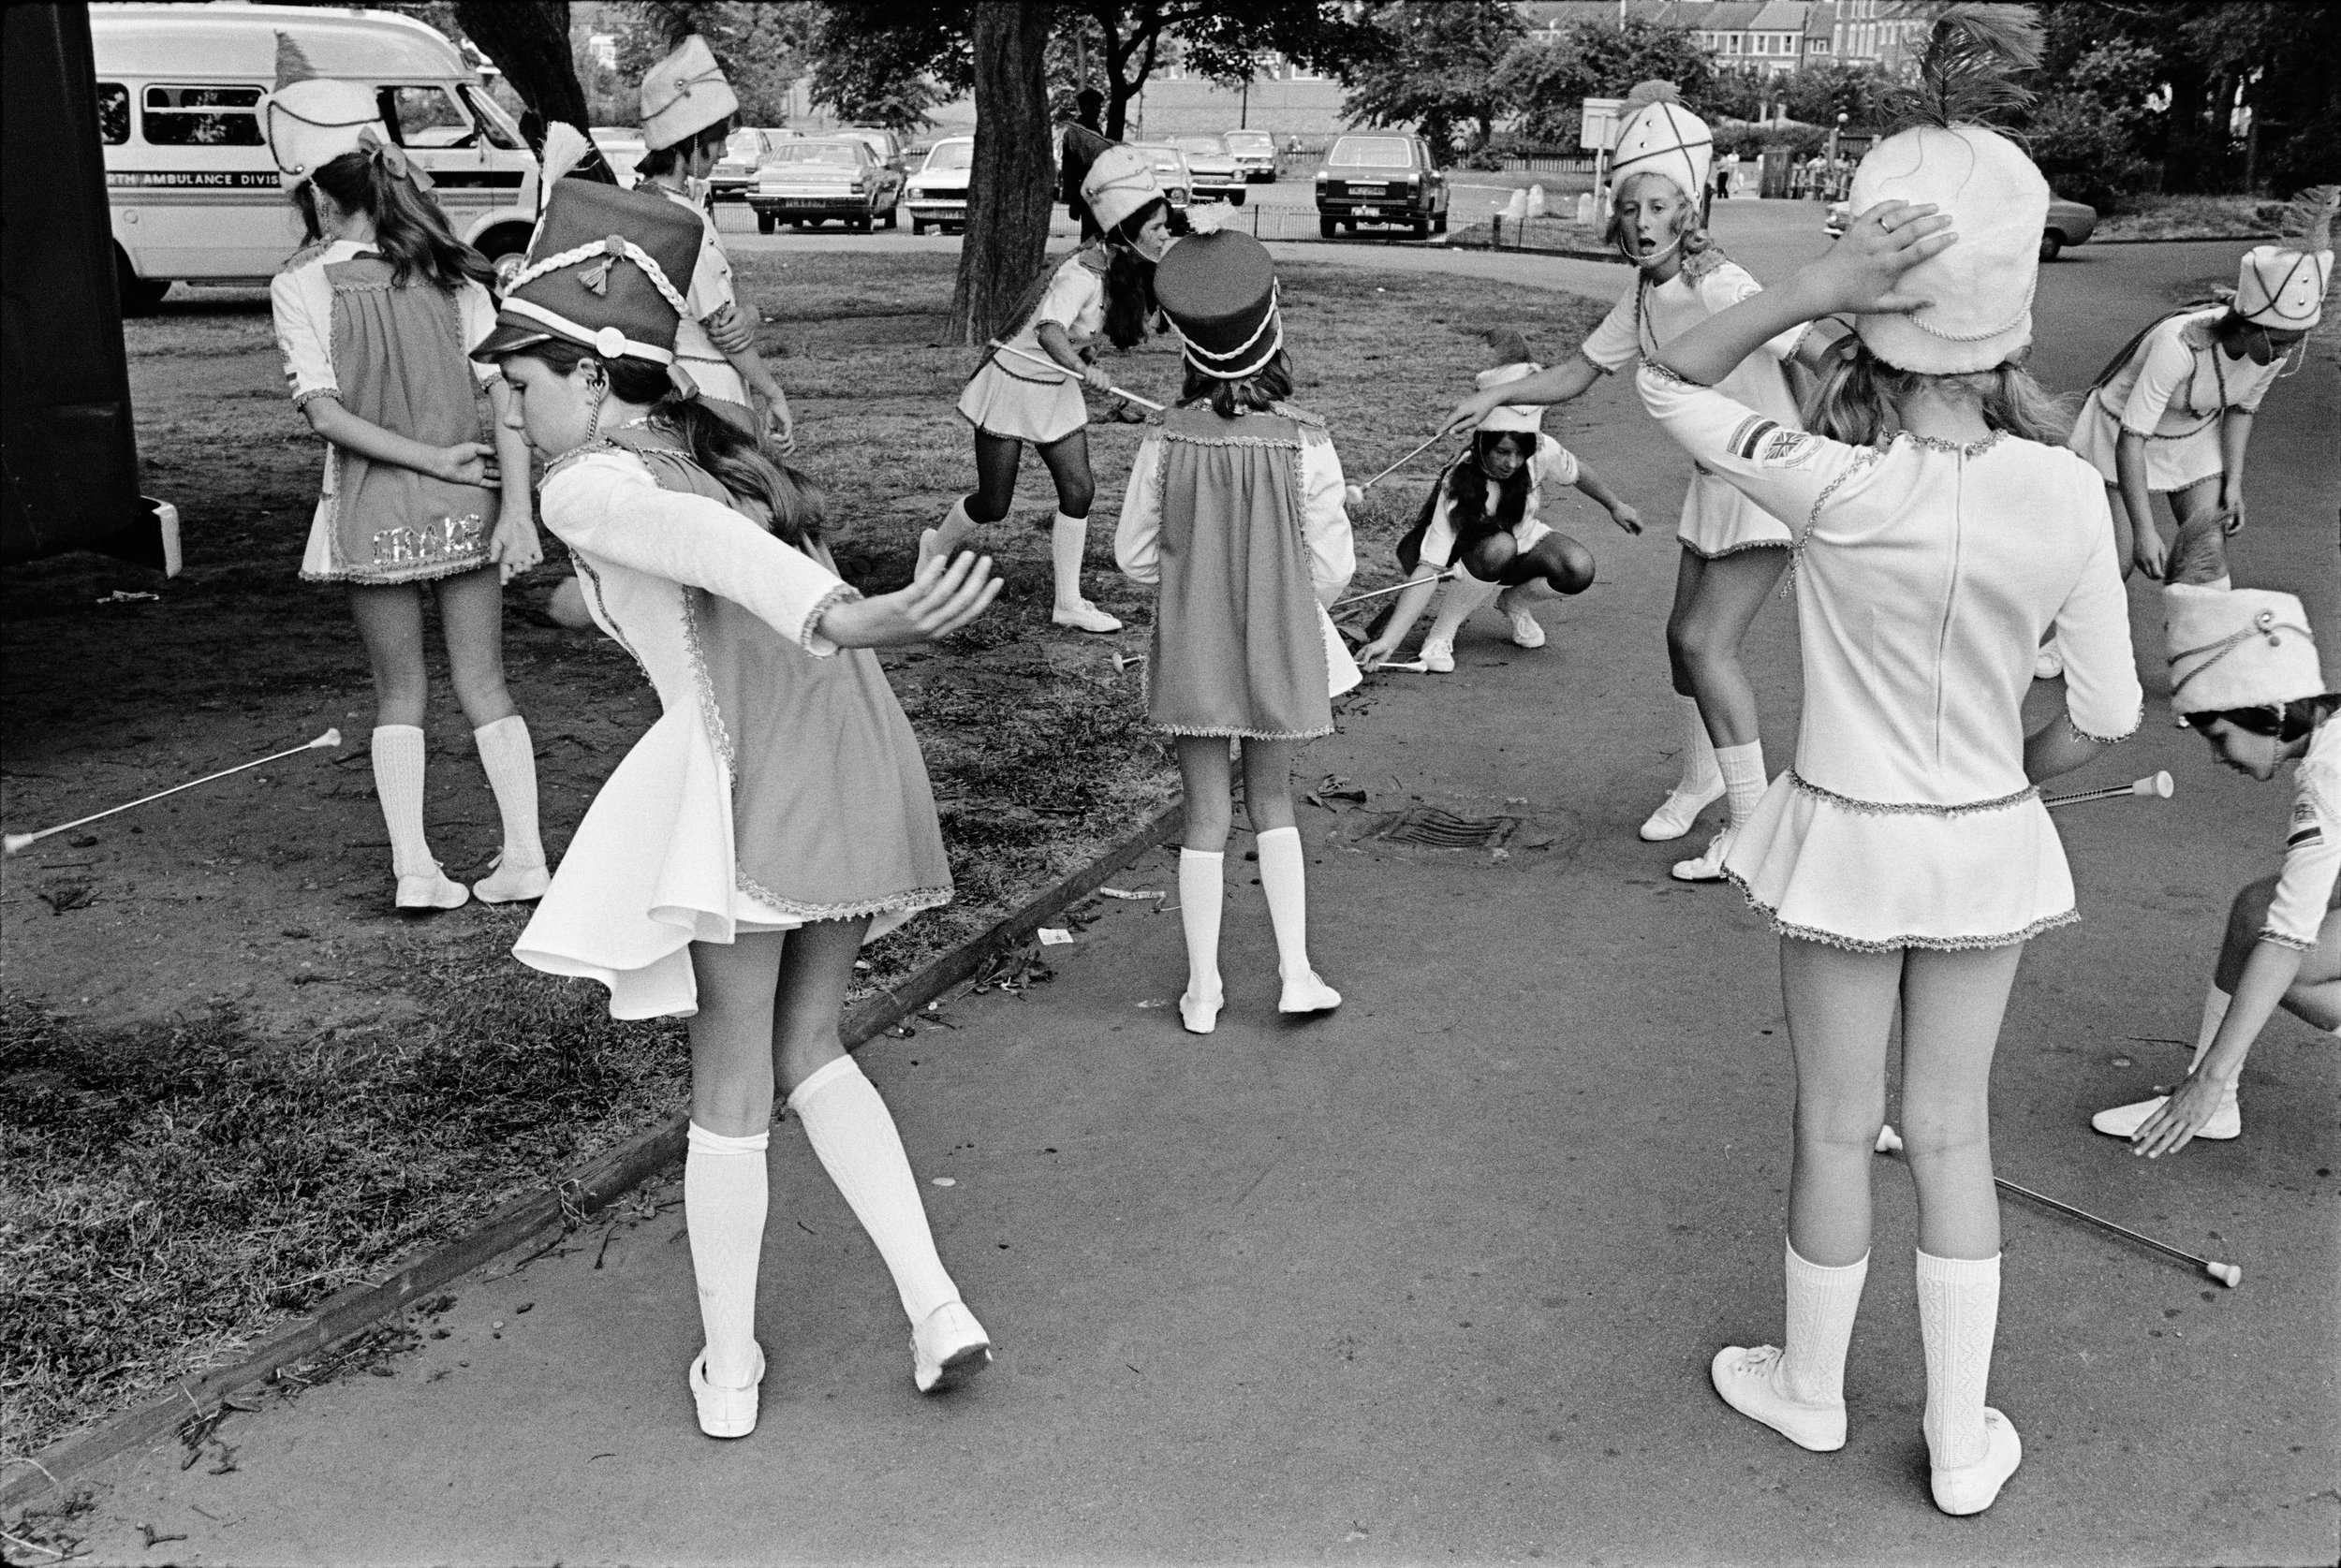 Drum Majorettes, 1975